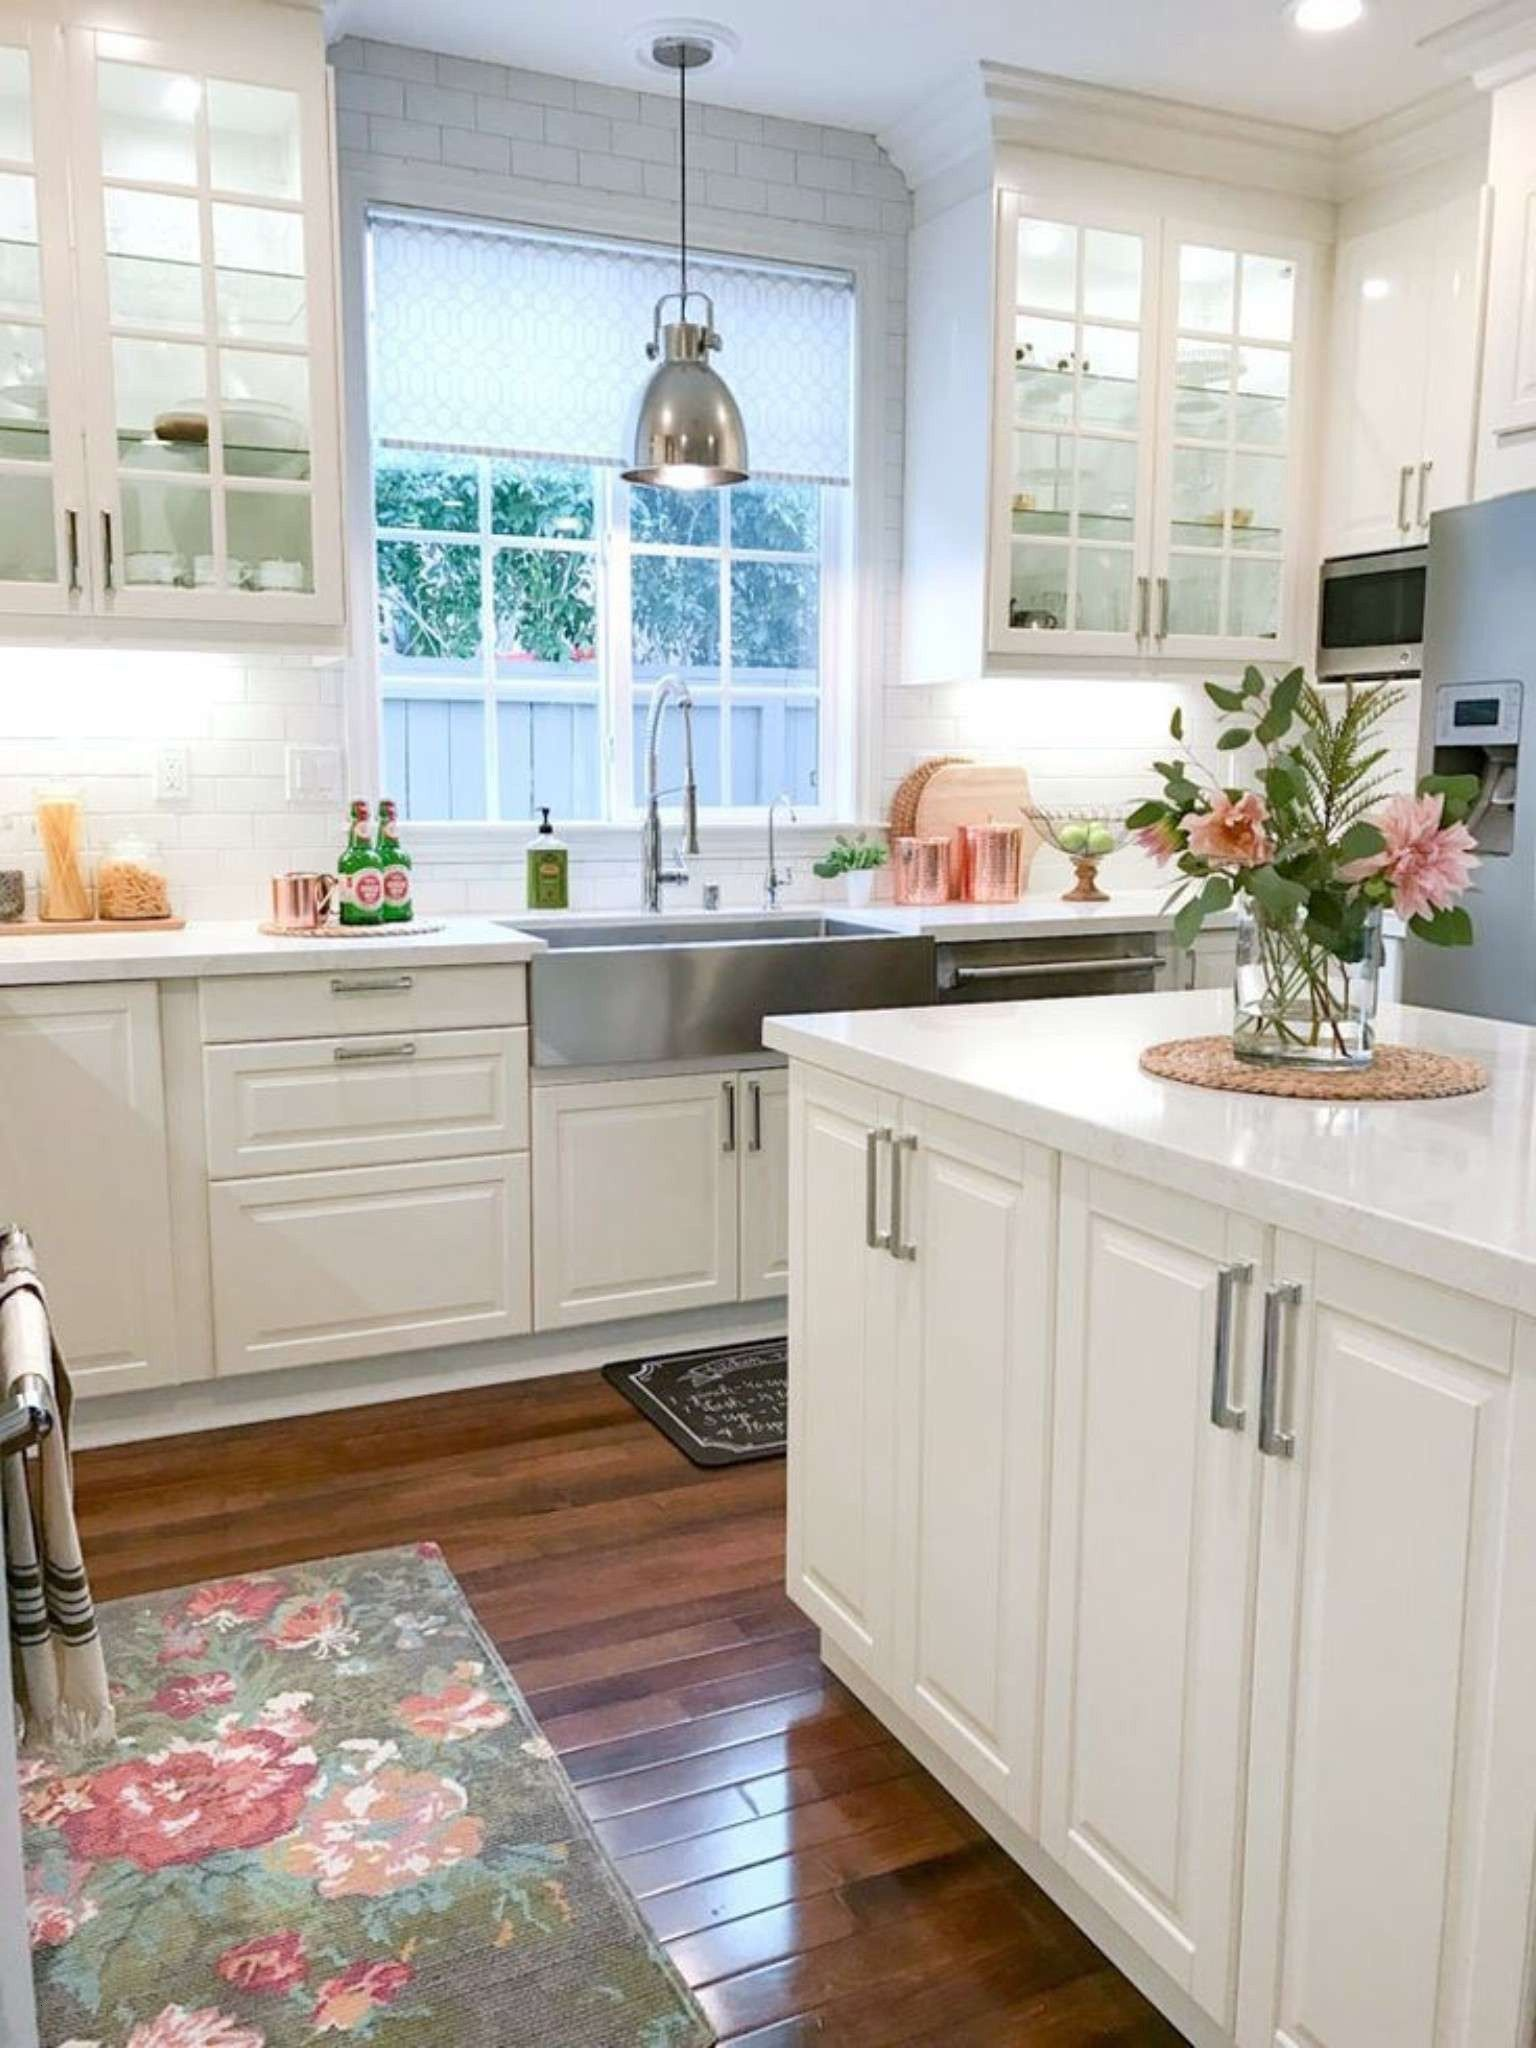 Pin By Liliana On Room Decor Cheap Kitchen Makeover Kitchen Sink Decor Kitchen Cabinet Design